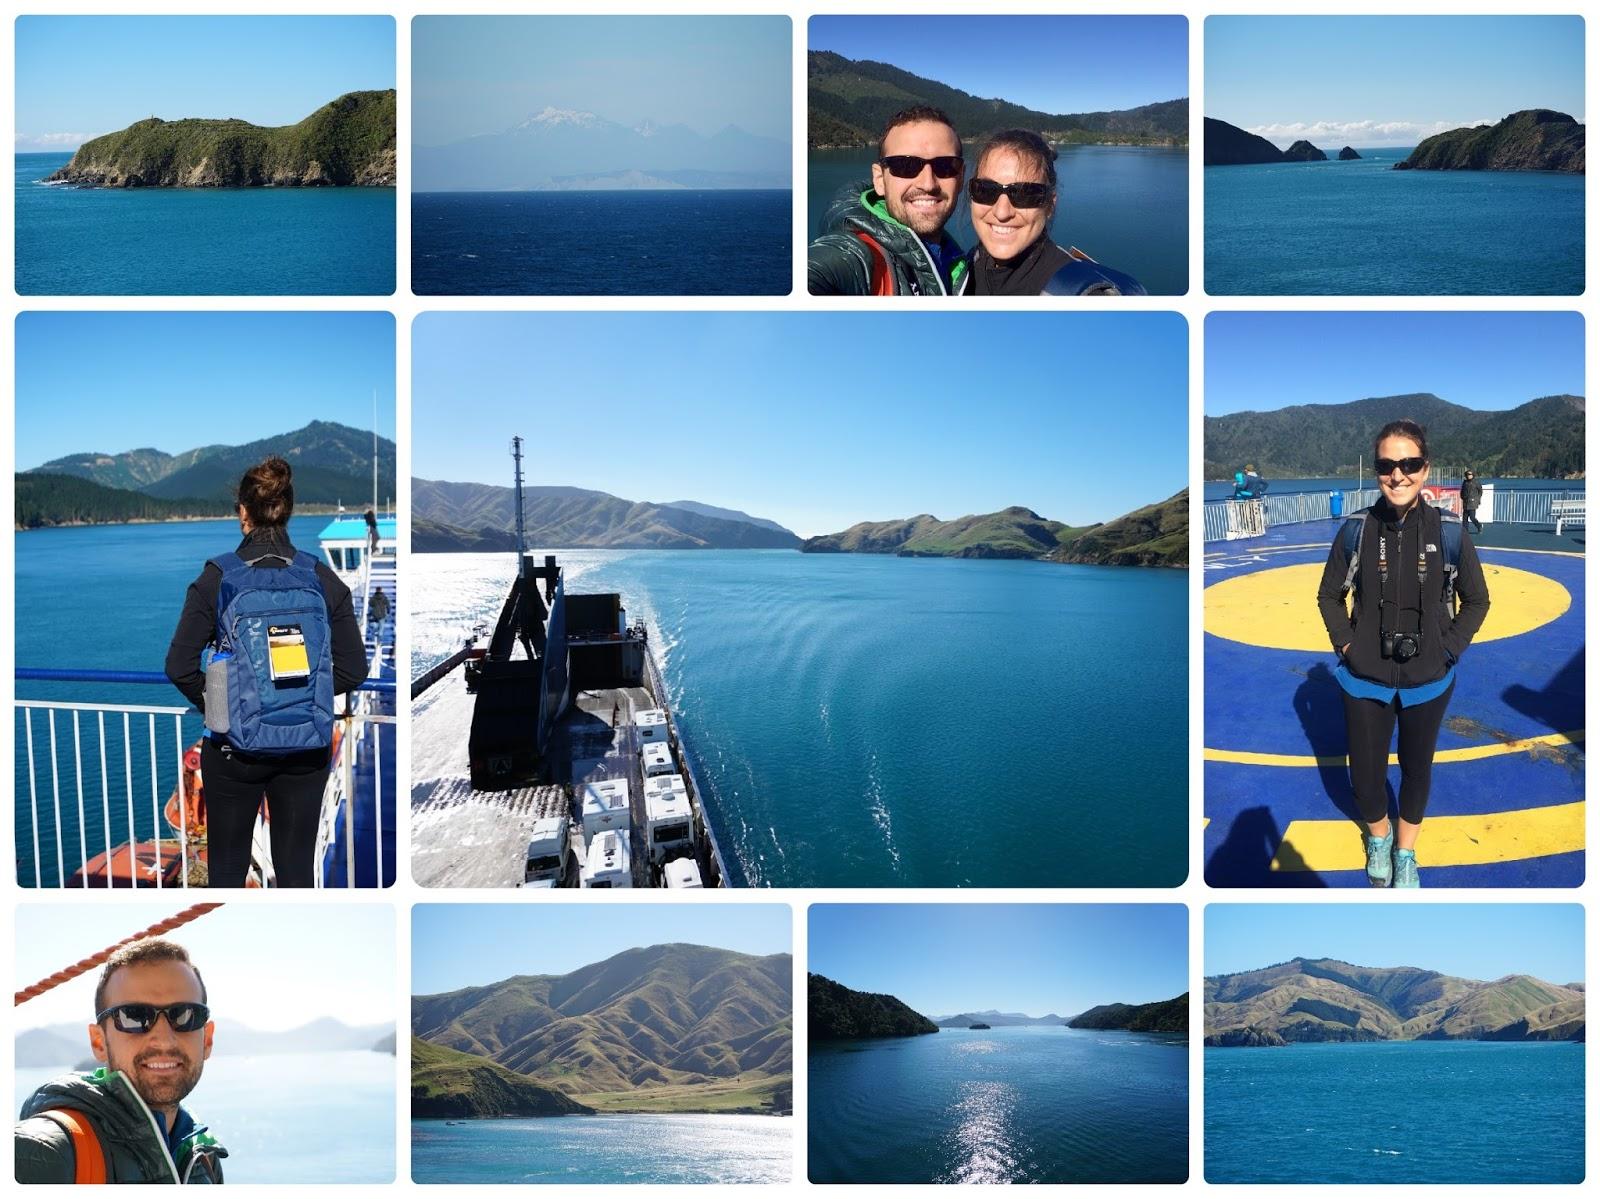 Dandy S Grand Adventure Abel Tasman Region New Zealand South